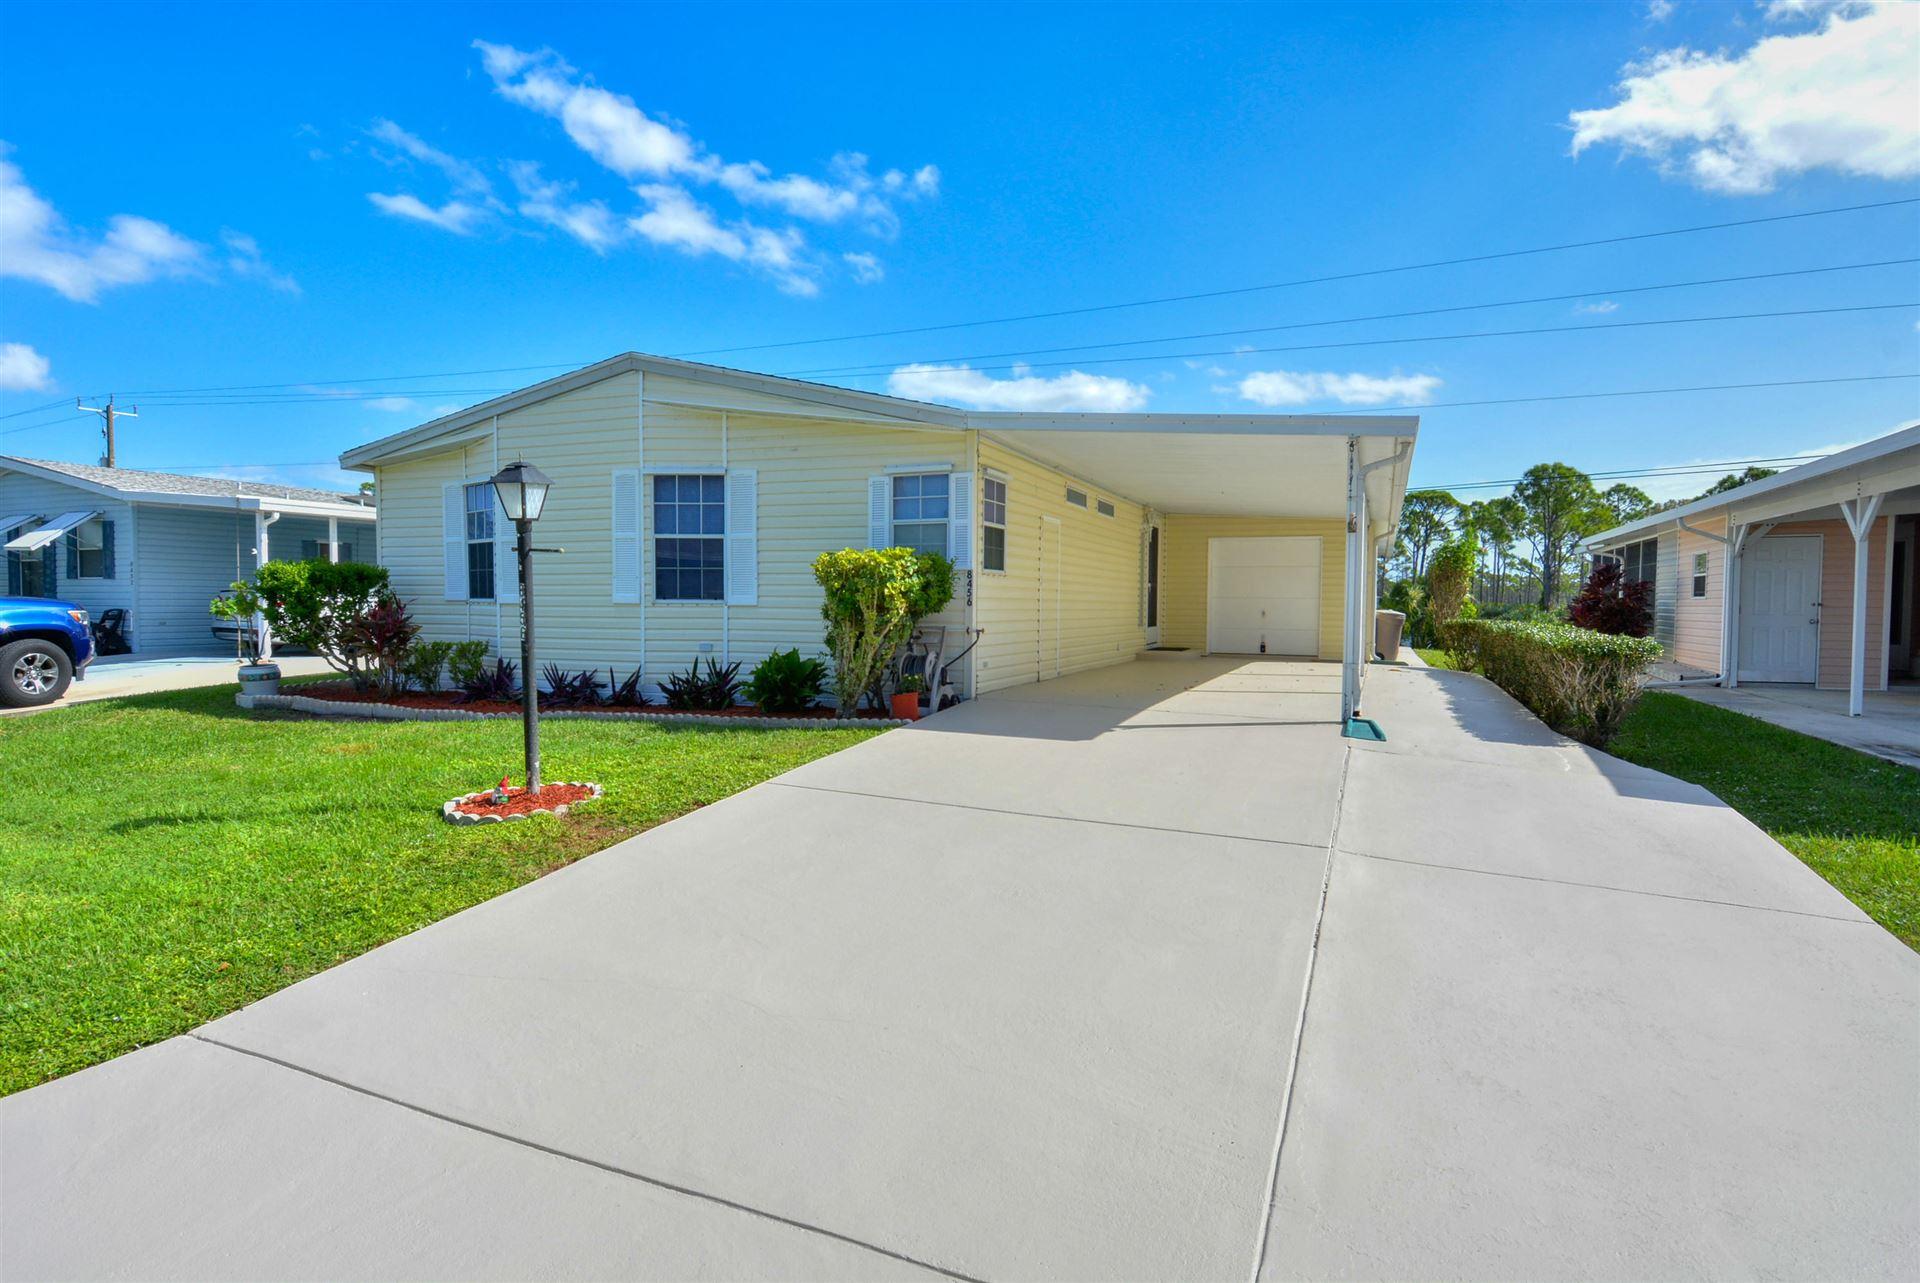 8456 Gallberry Circle, Port Saint Lucie, FL 34952 - #: RX-10666576